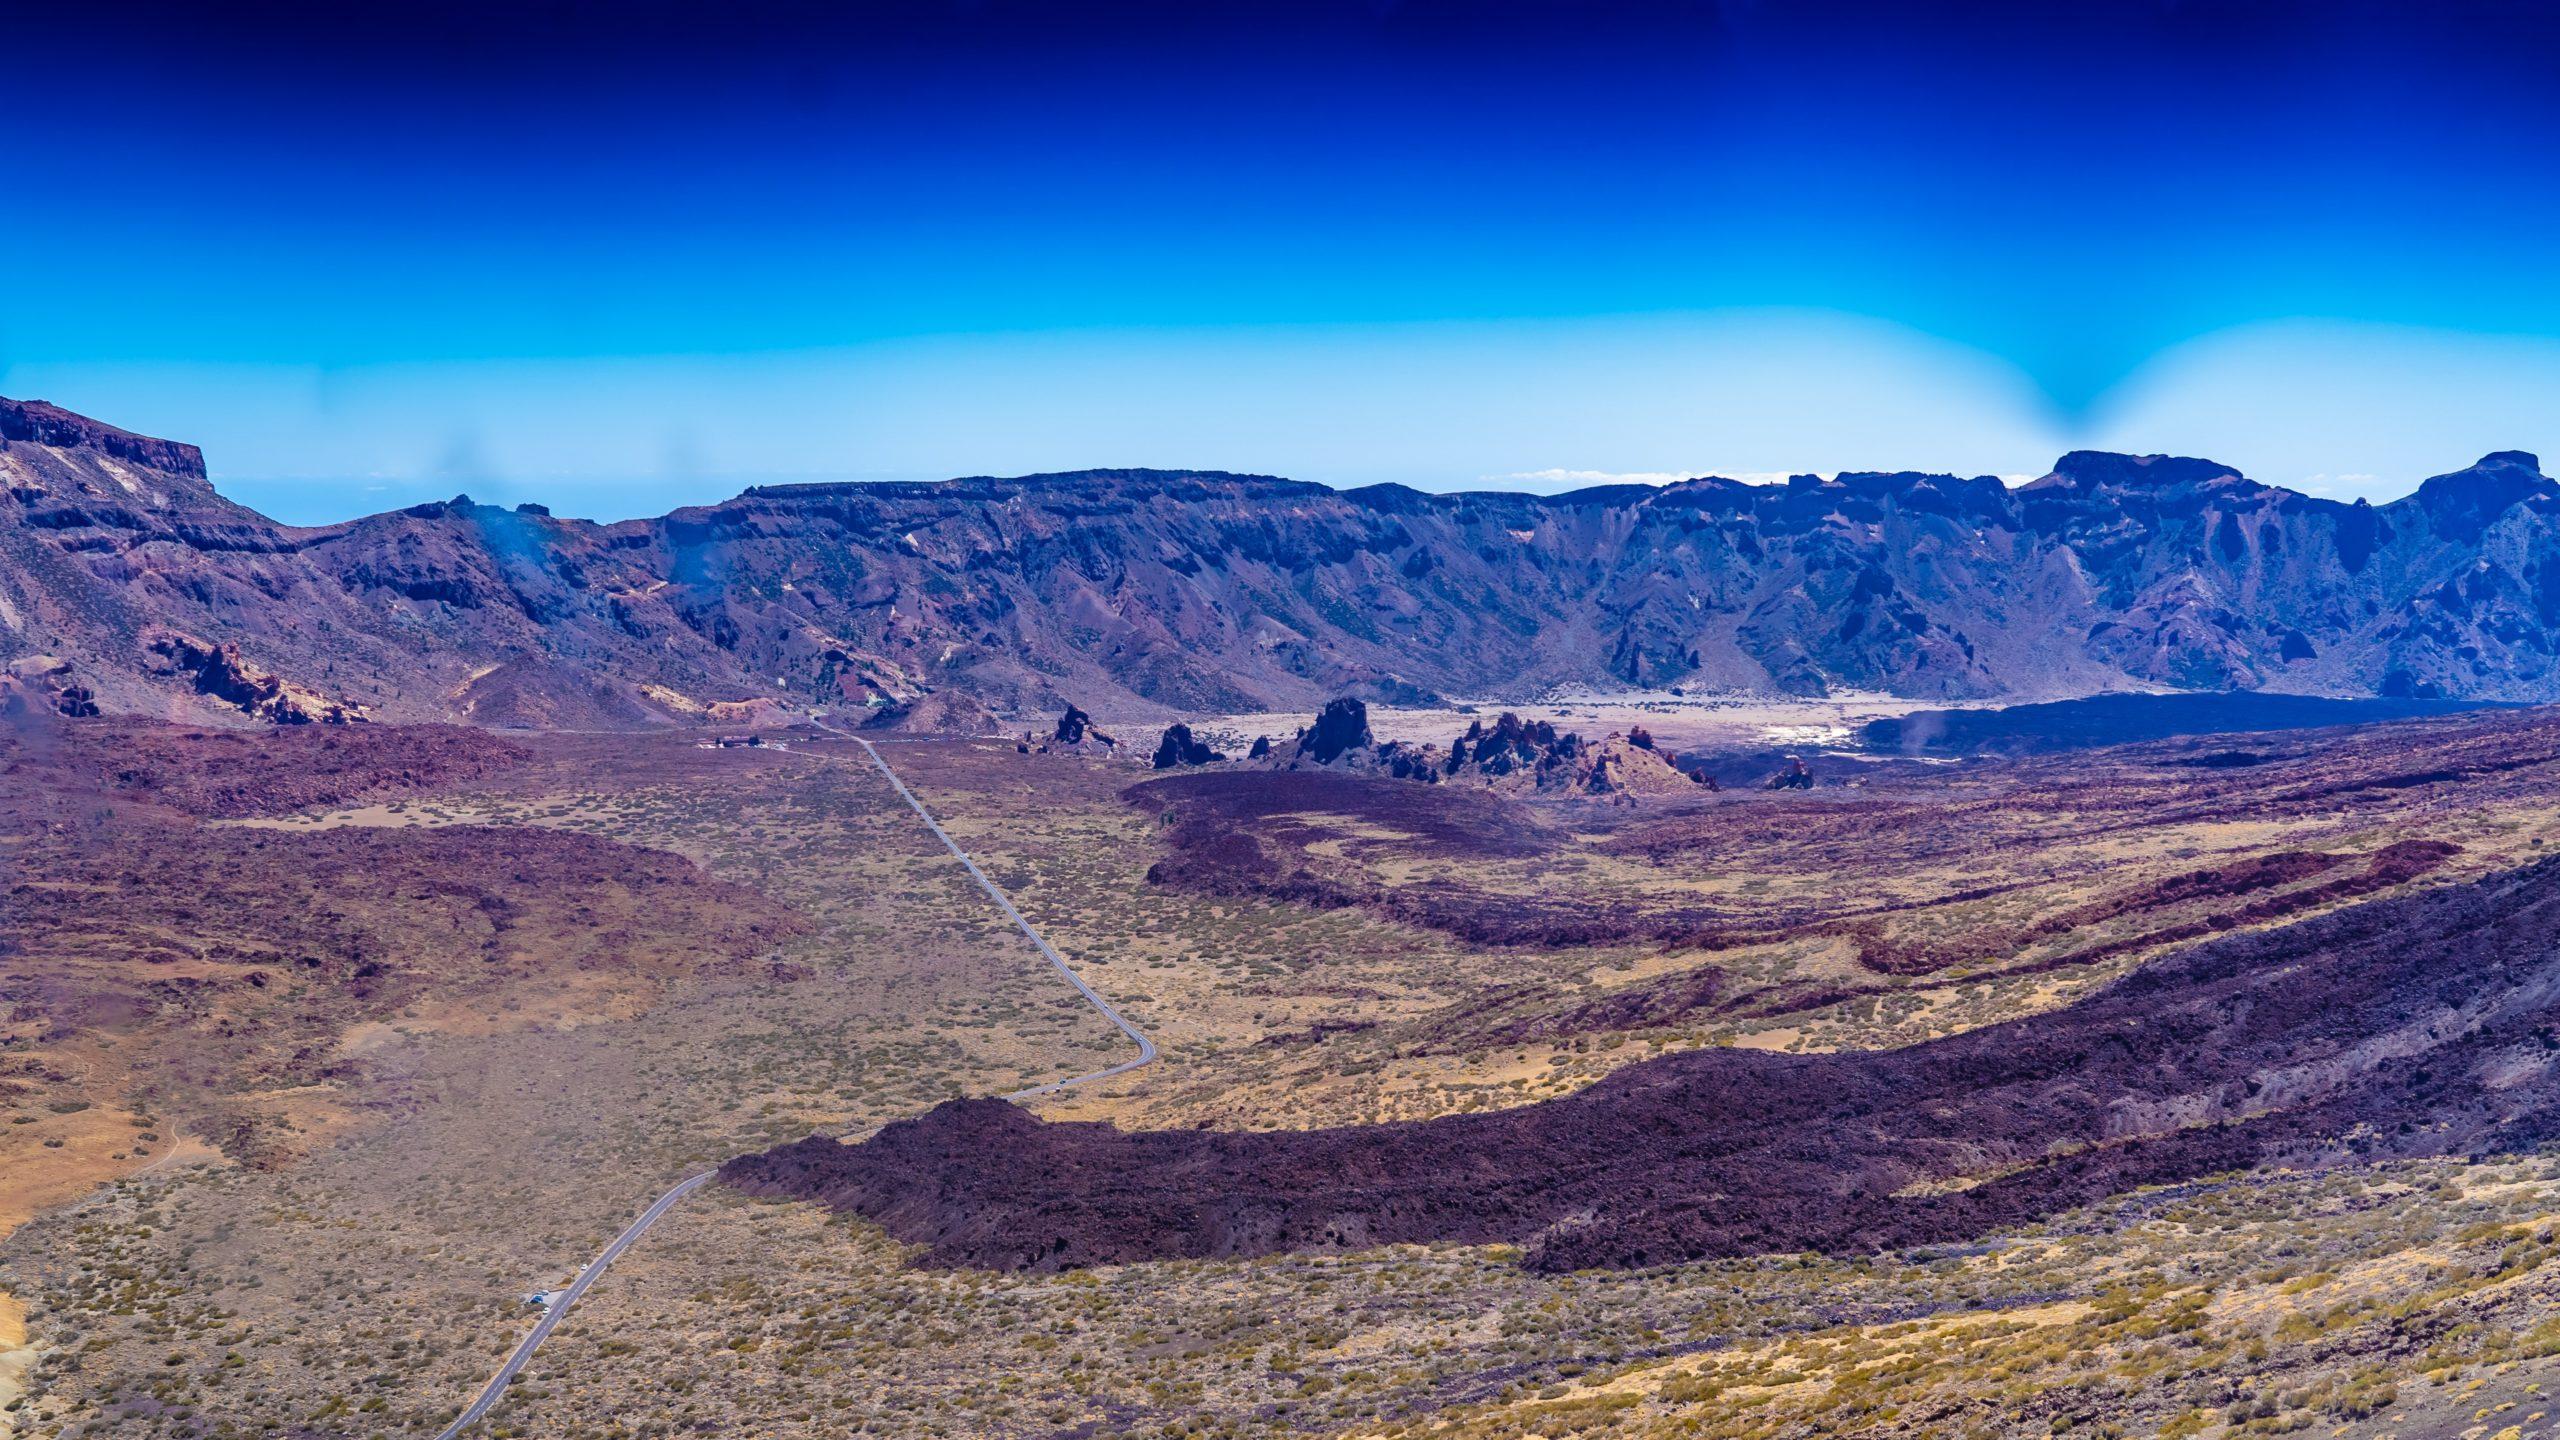 Atlantik, Teneriffa, in 2500 Meter Höhe, unterwegs zum Pico del Teide